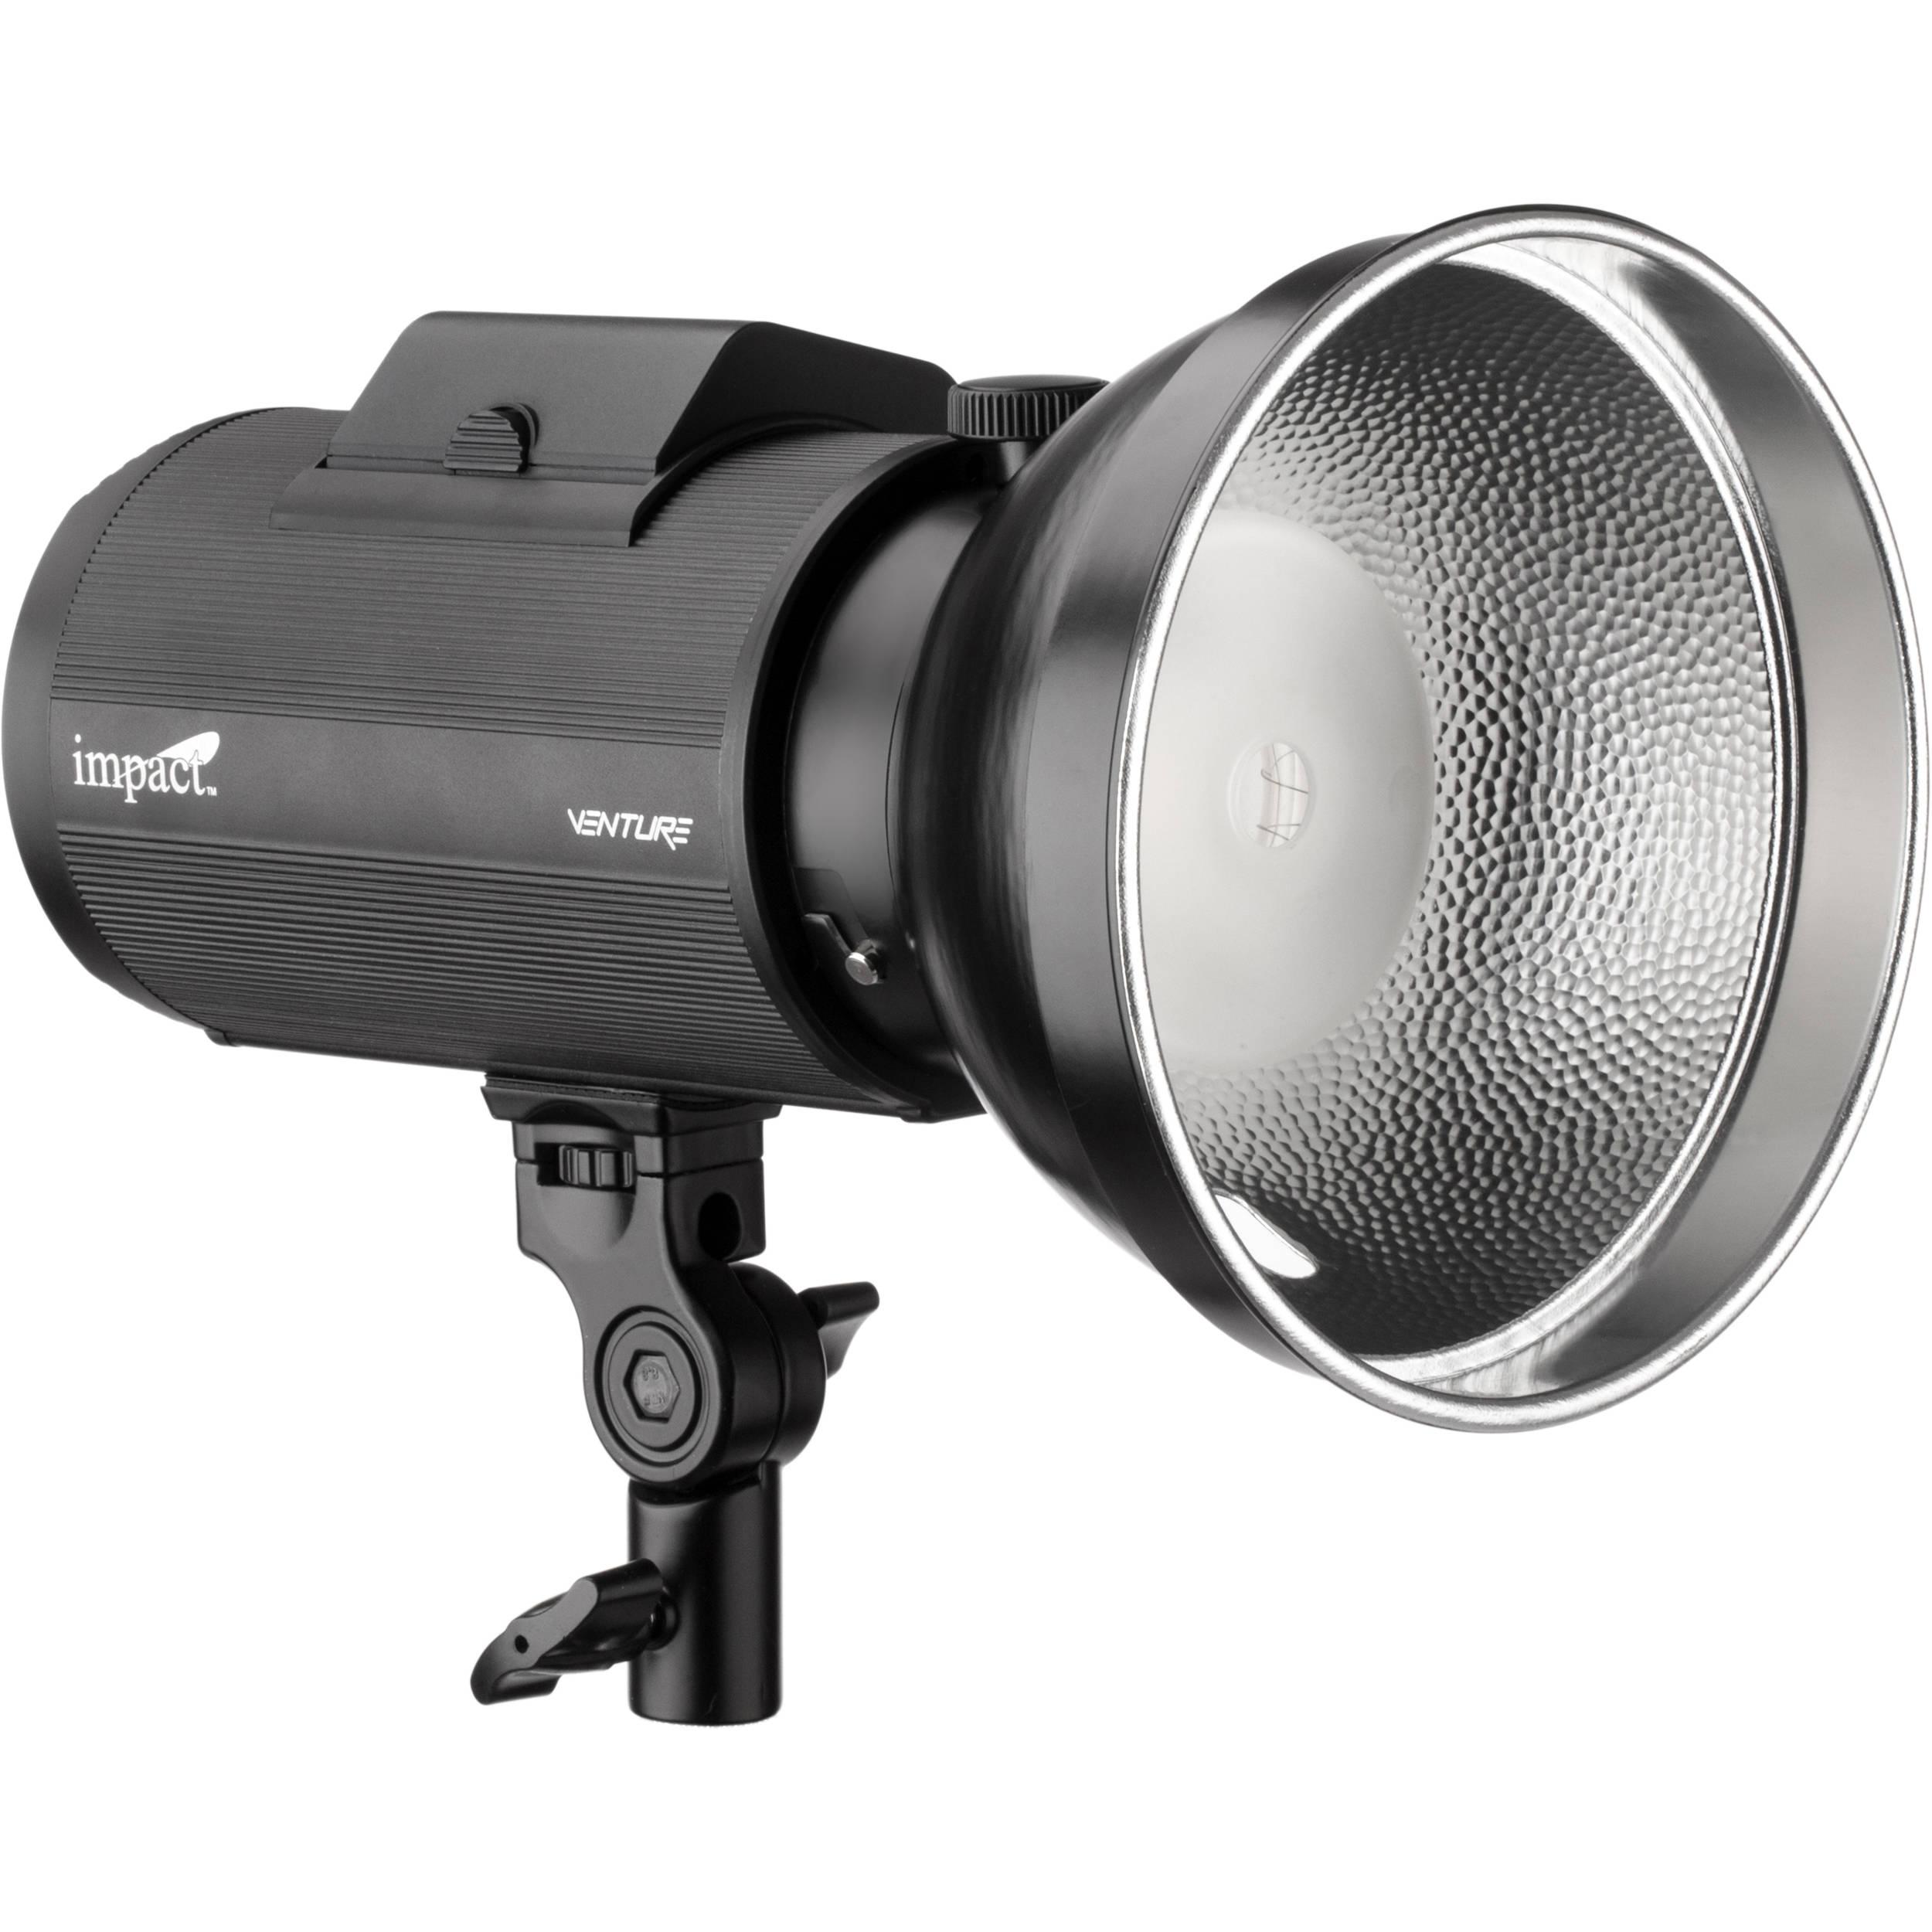 Impact Venture TTL-600 Battery-Powered Monolight  sc 1 st  Bu0026H & Impact Battery Powered Strobe Lighting | Bu0026H Photo Video azcodes.com